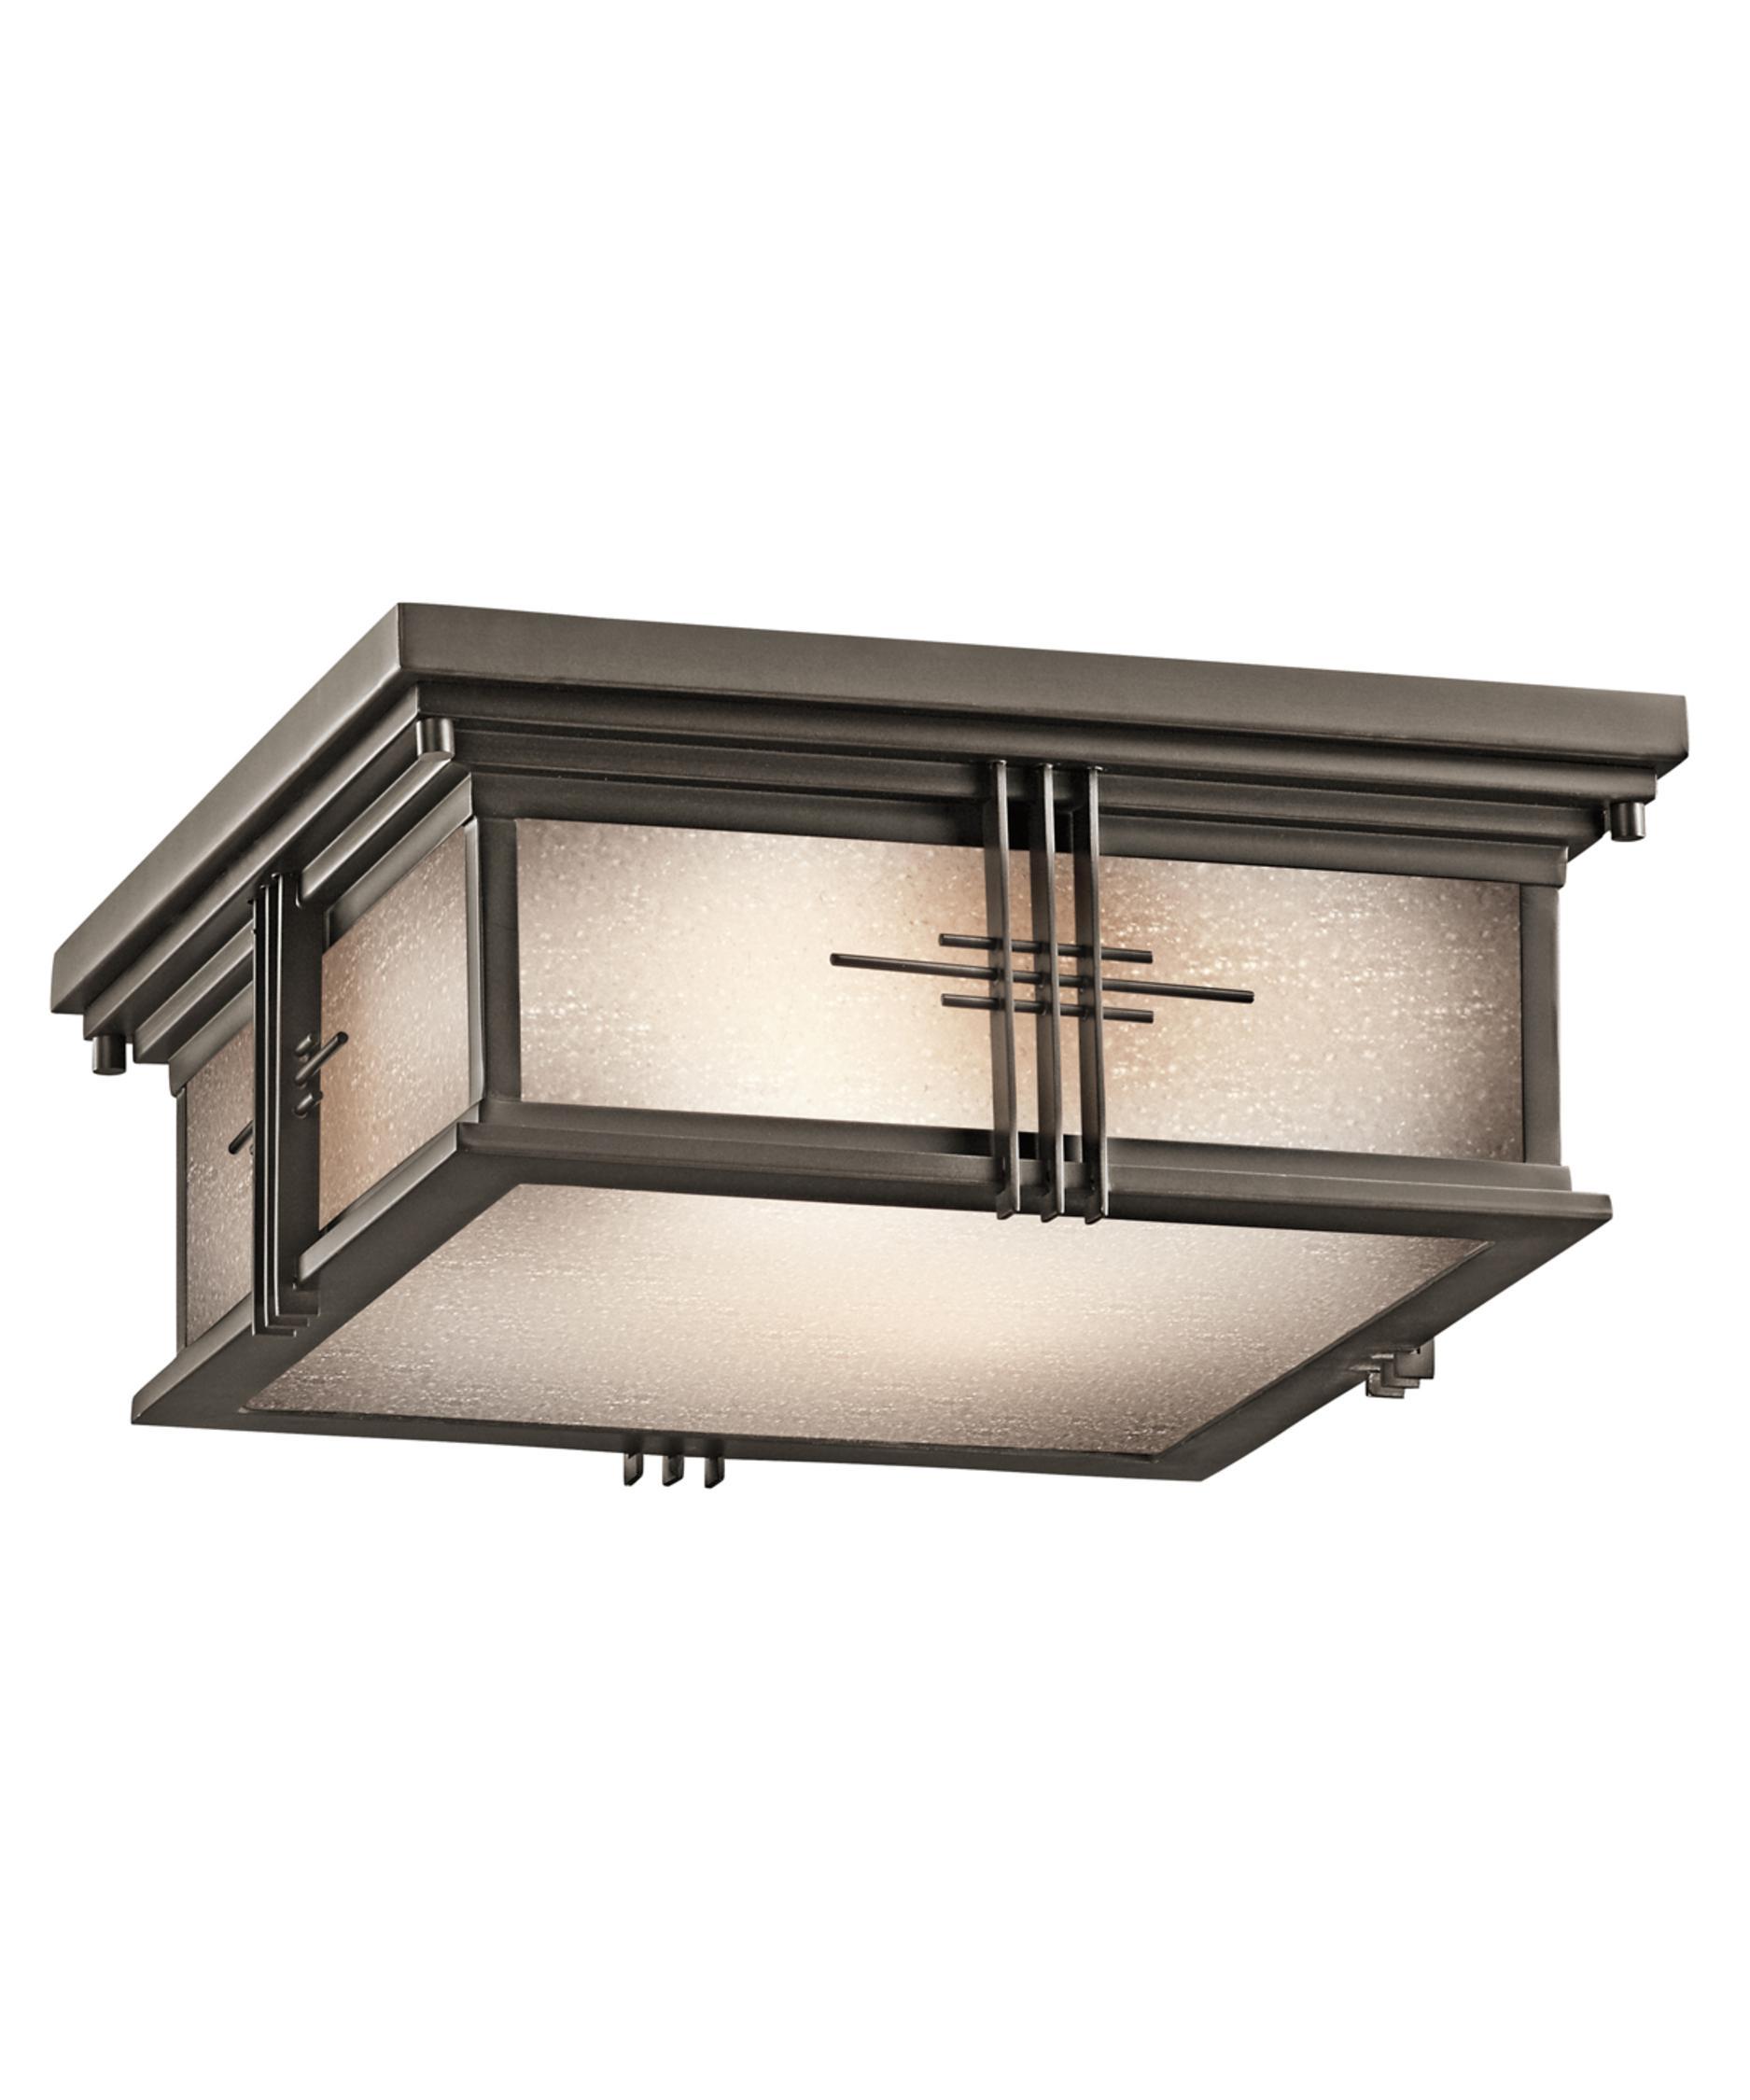 Kichler 49164 Portman Square 12 Inch Wide 2 Light Outdoor Flush